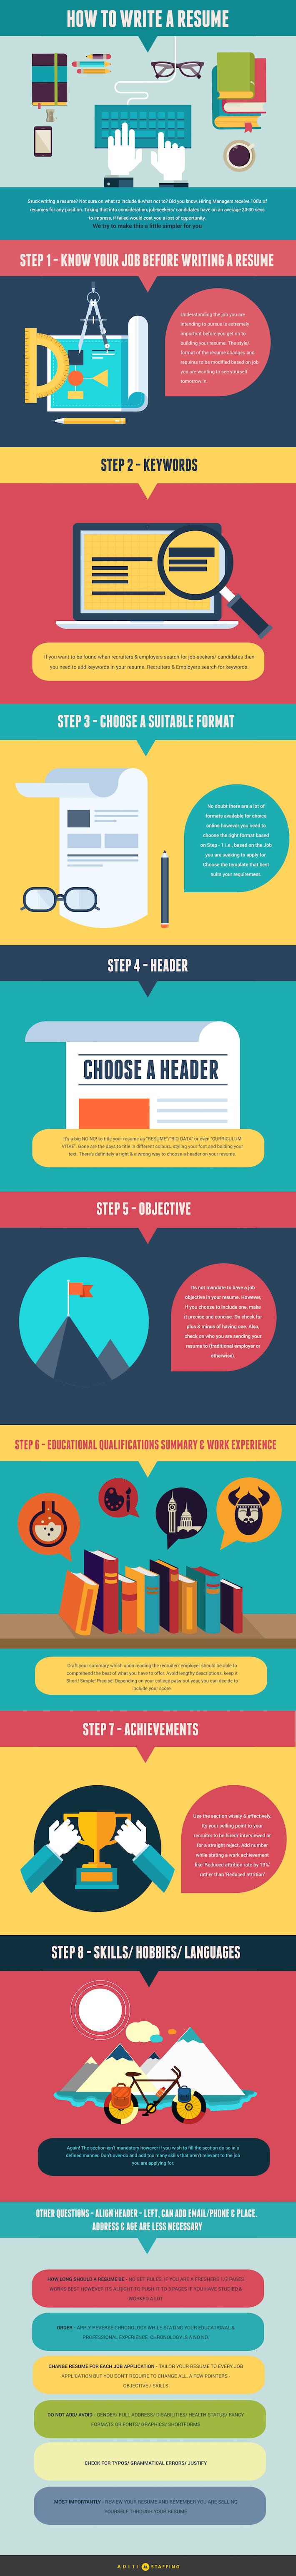 8 pasos claves para redactar el curriculum perfecto | paredro.com